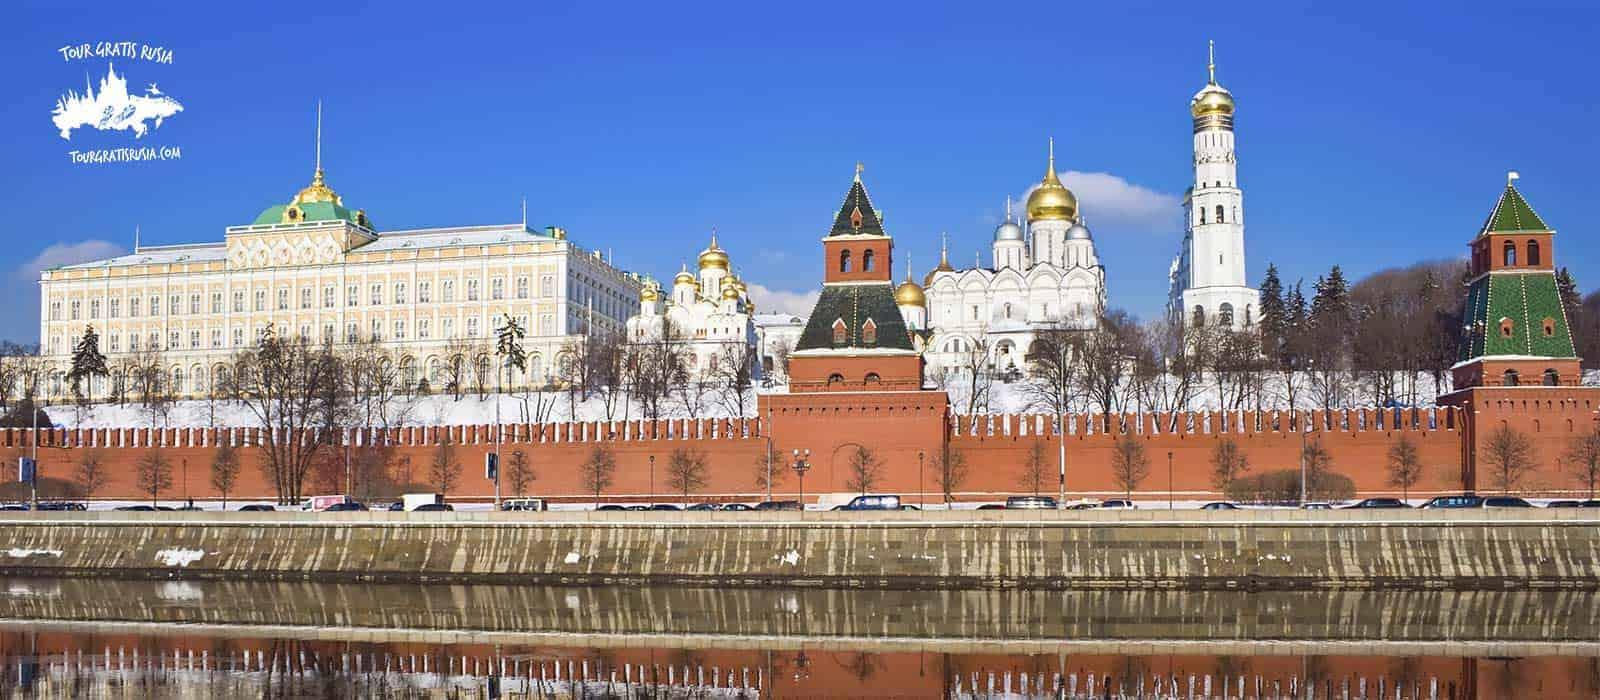 Tour en Kremlin Territorio y Catedrales